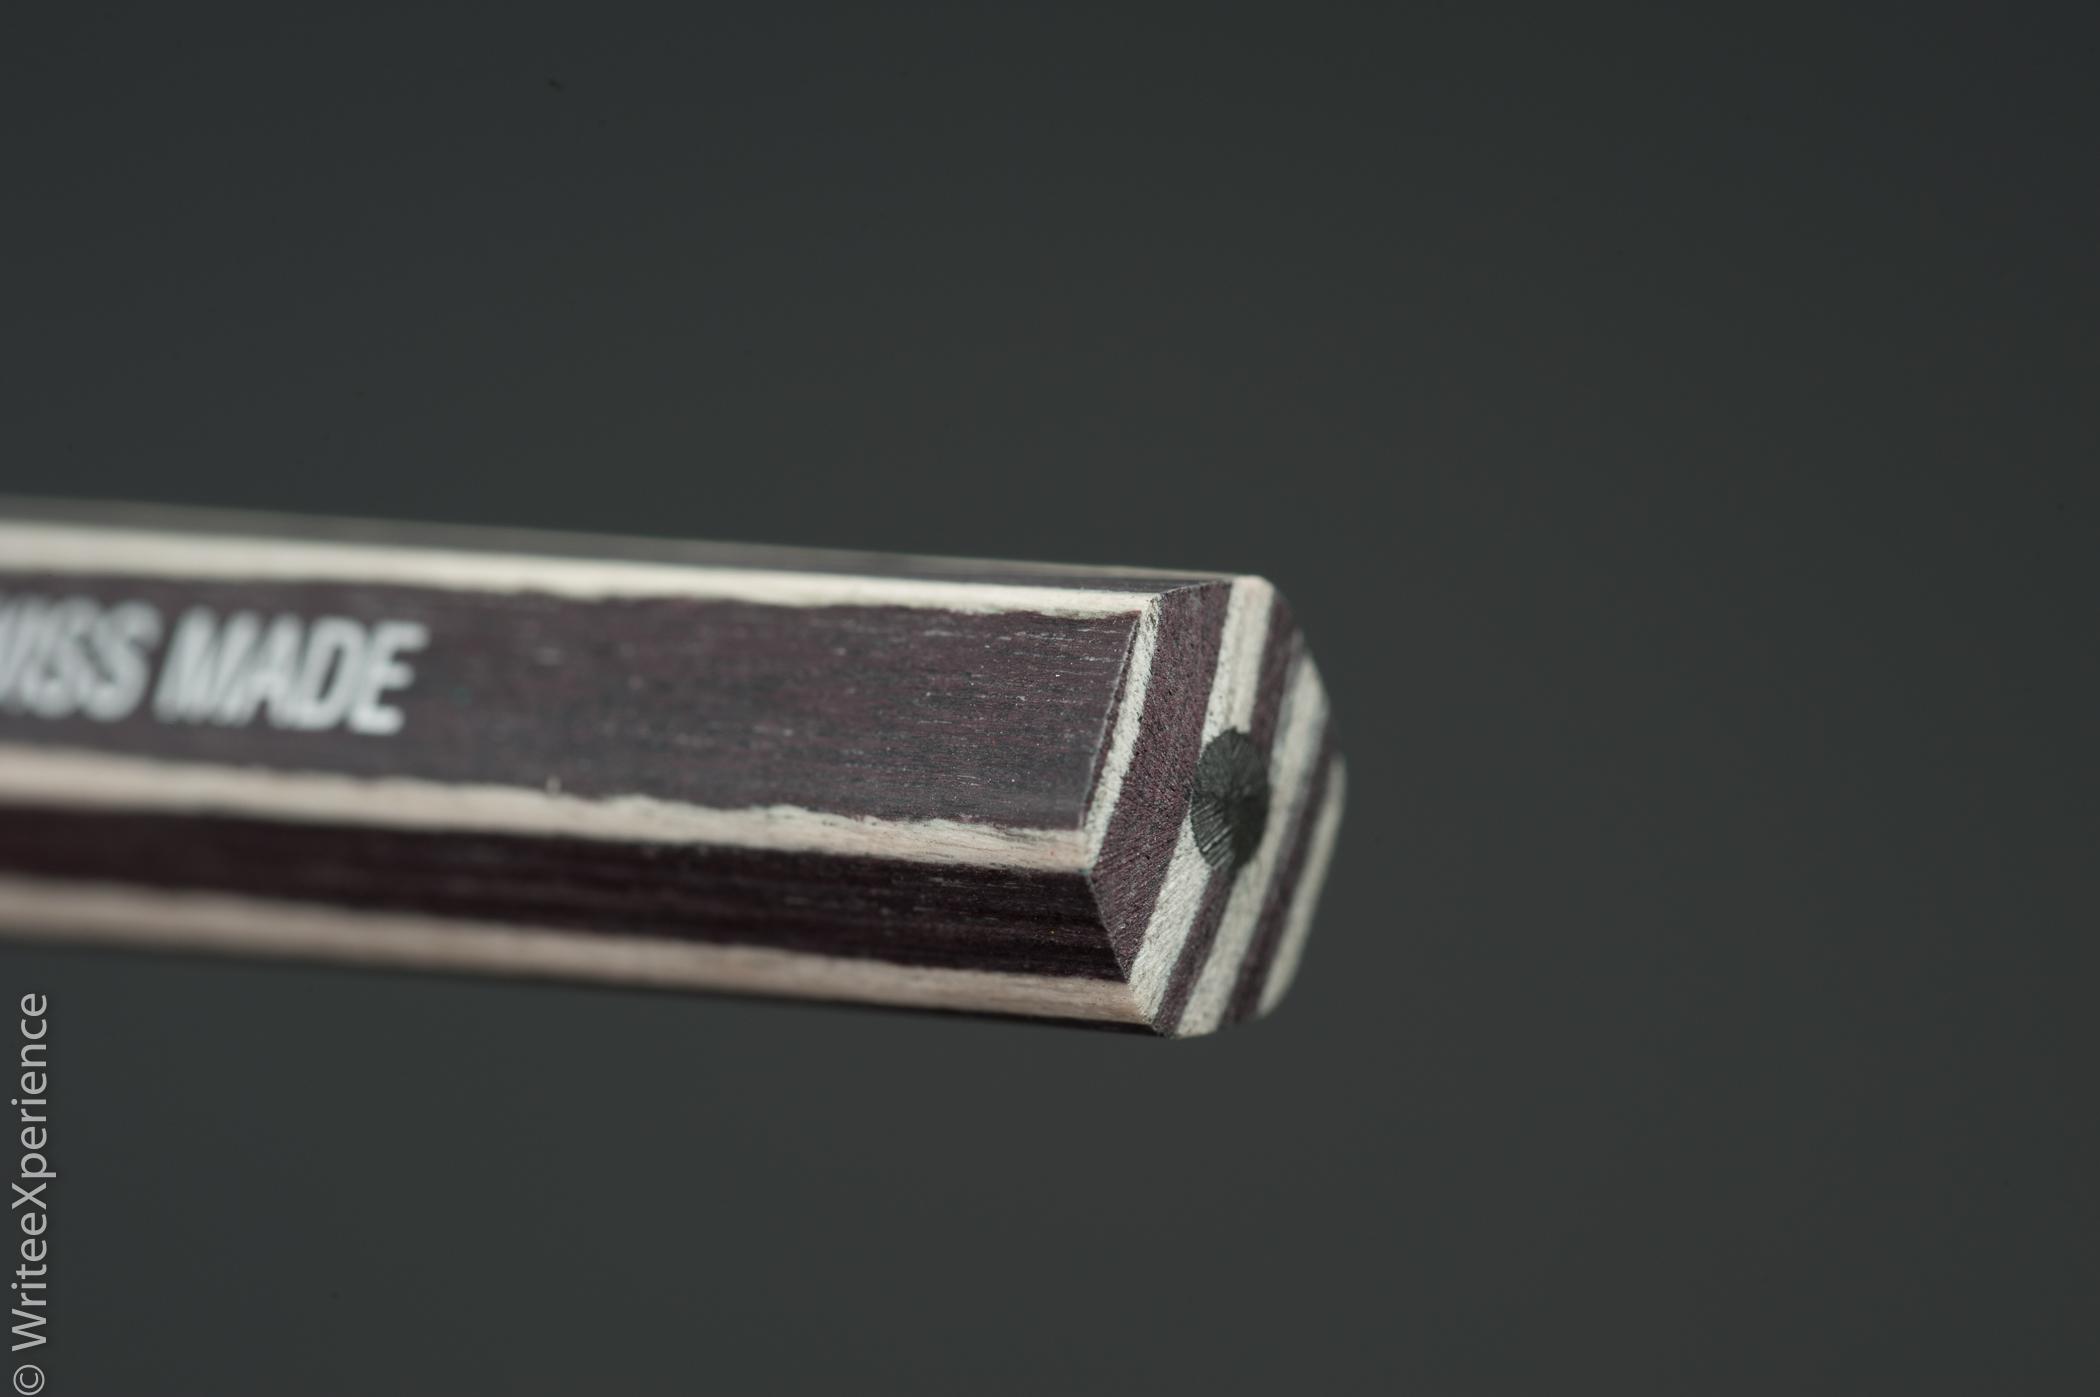 WriteeXperience-Caran-dache-noblewood-pencils-5th-10.jpg